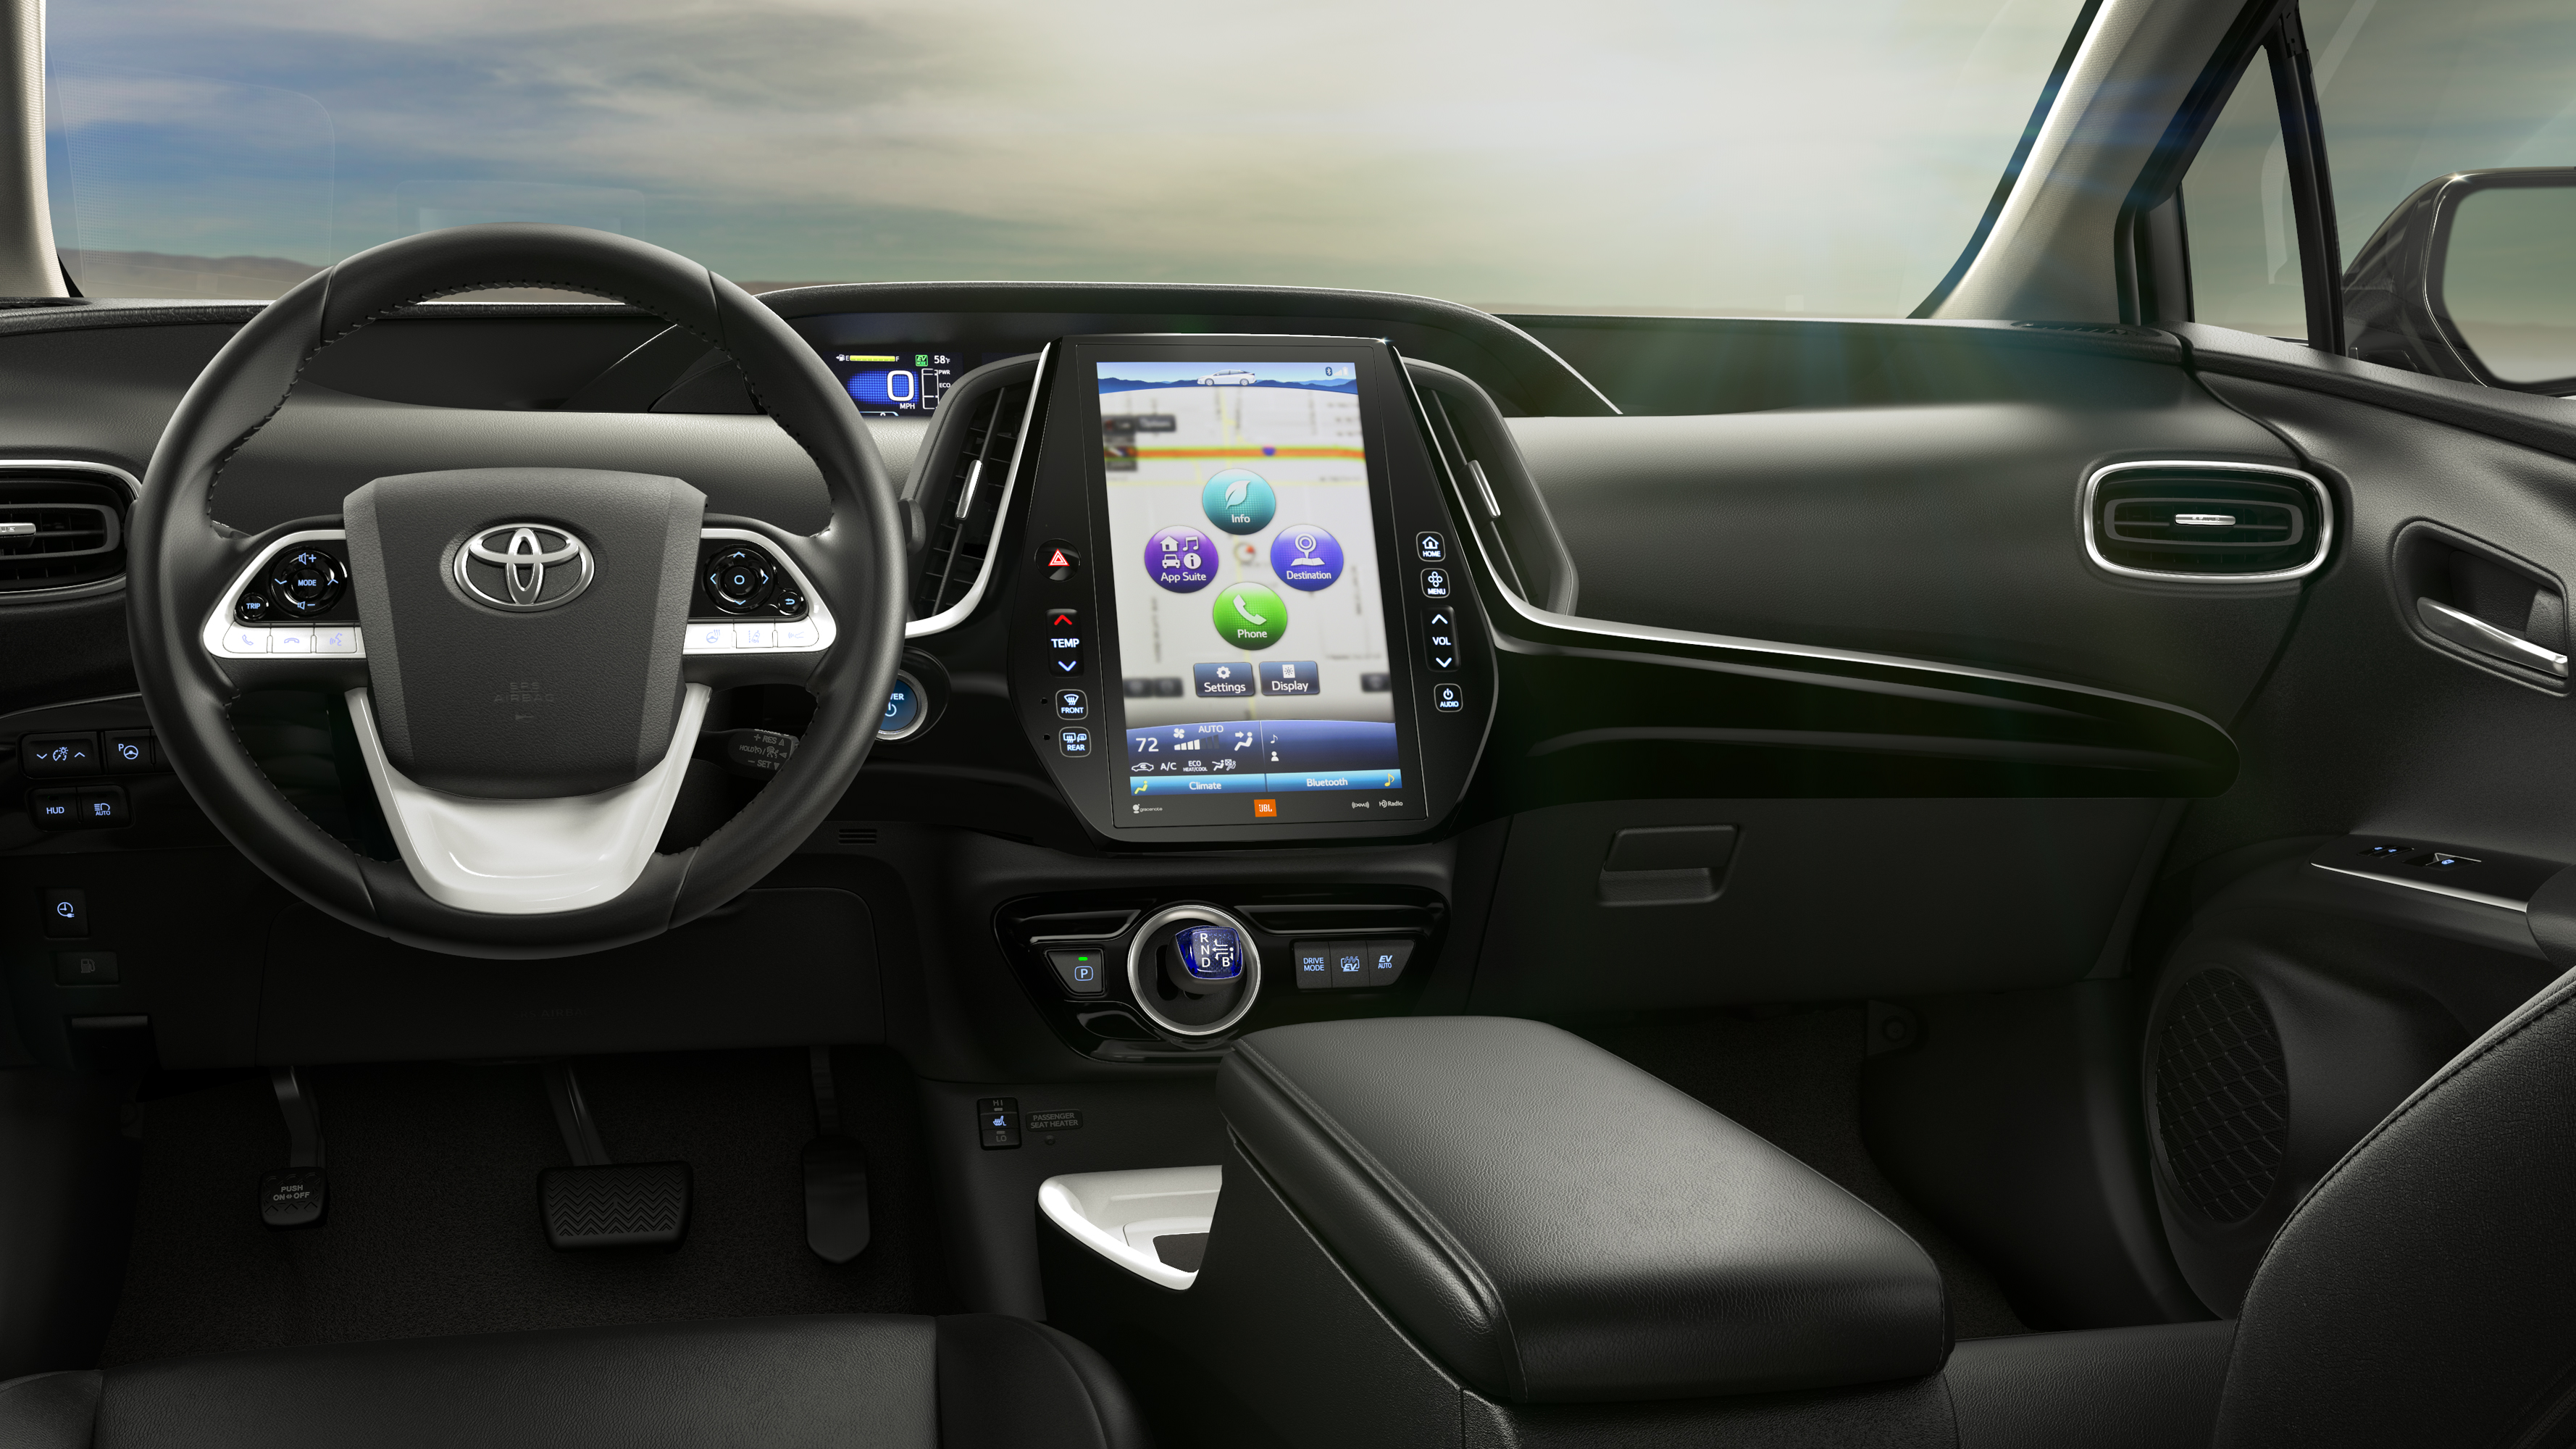 2017_Toyota_Prius_Prime_05_8682D8F7450ECB52E28D5674038FC77AF578D4E0